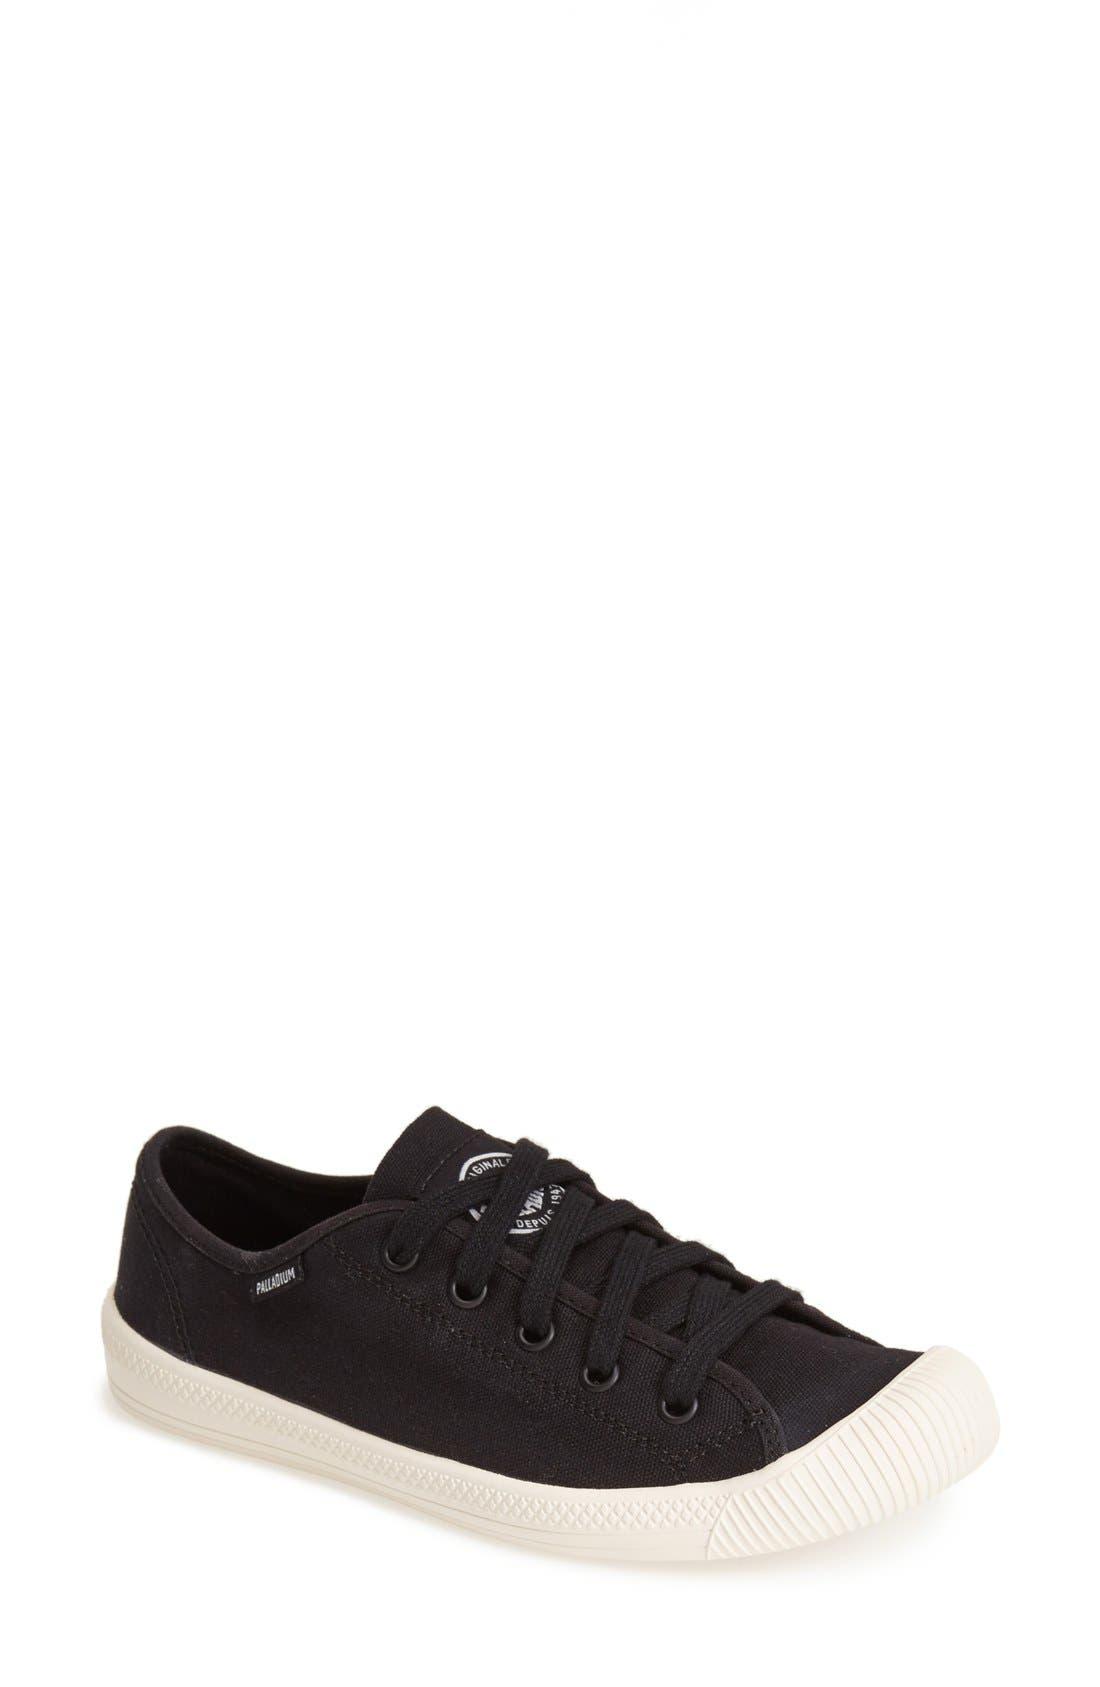 PALLADIUM 'Flex Lace' Sneaker, Main, color, 005